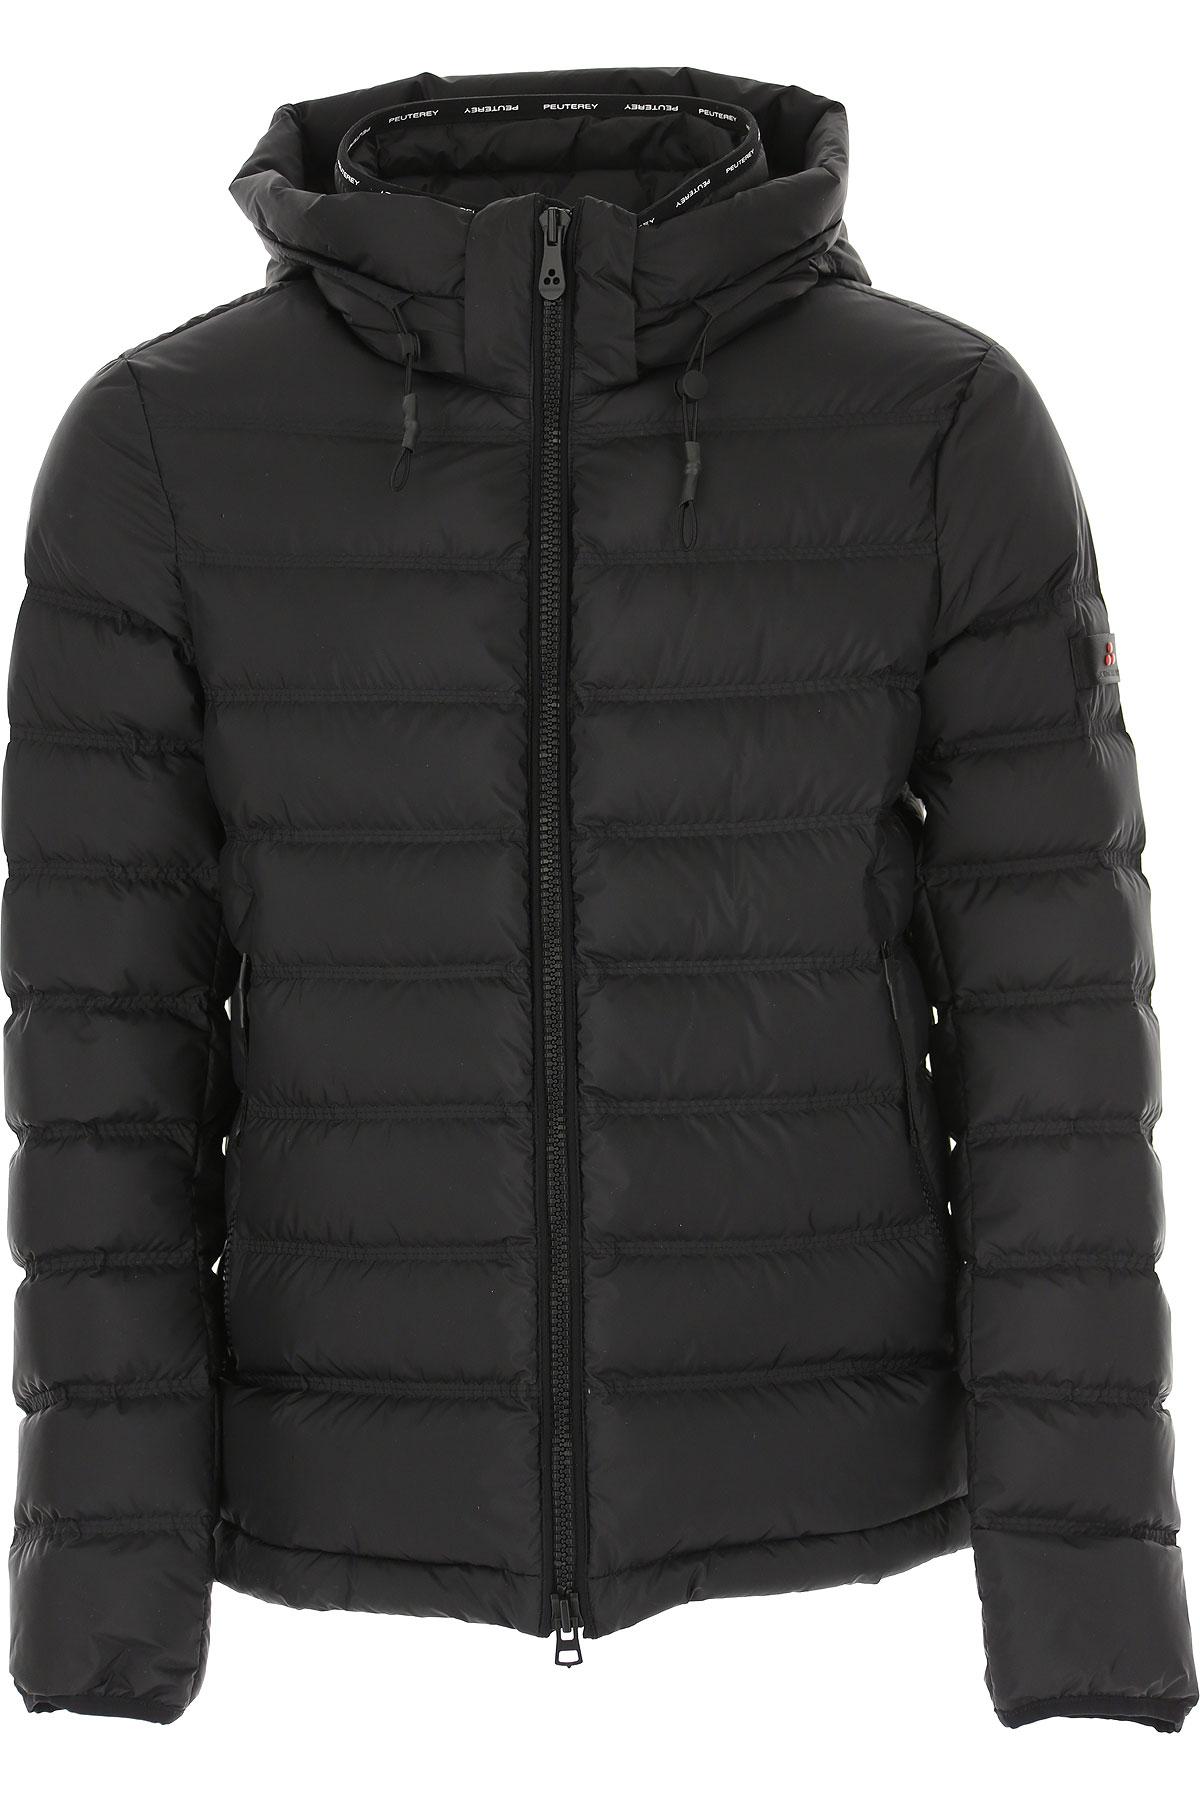 Peuterey Down Jacket for Men, Puffer Ski Jacket On Sale, Black, polyester, 2019, L M S XL XXL